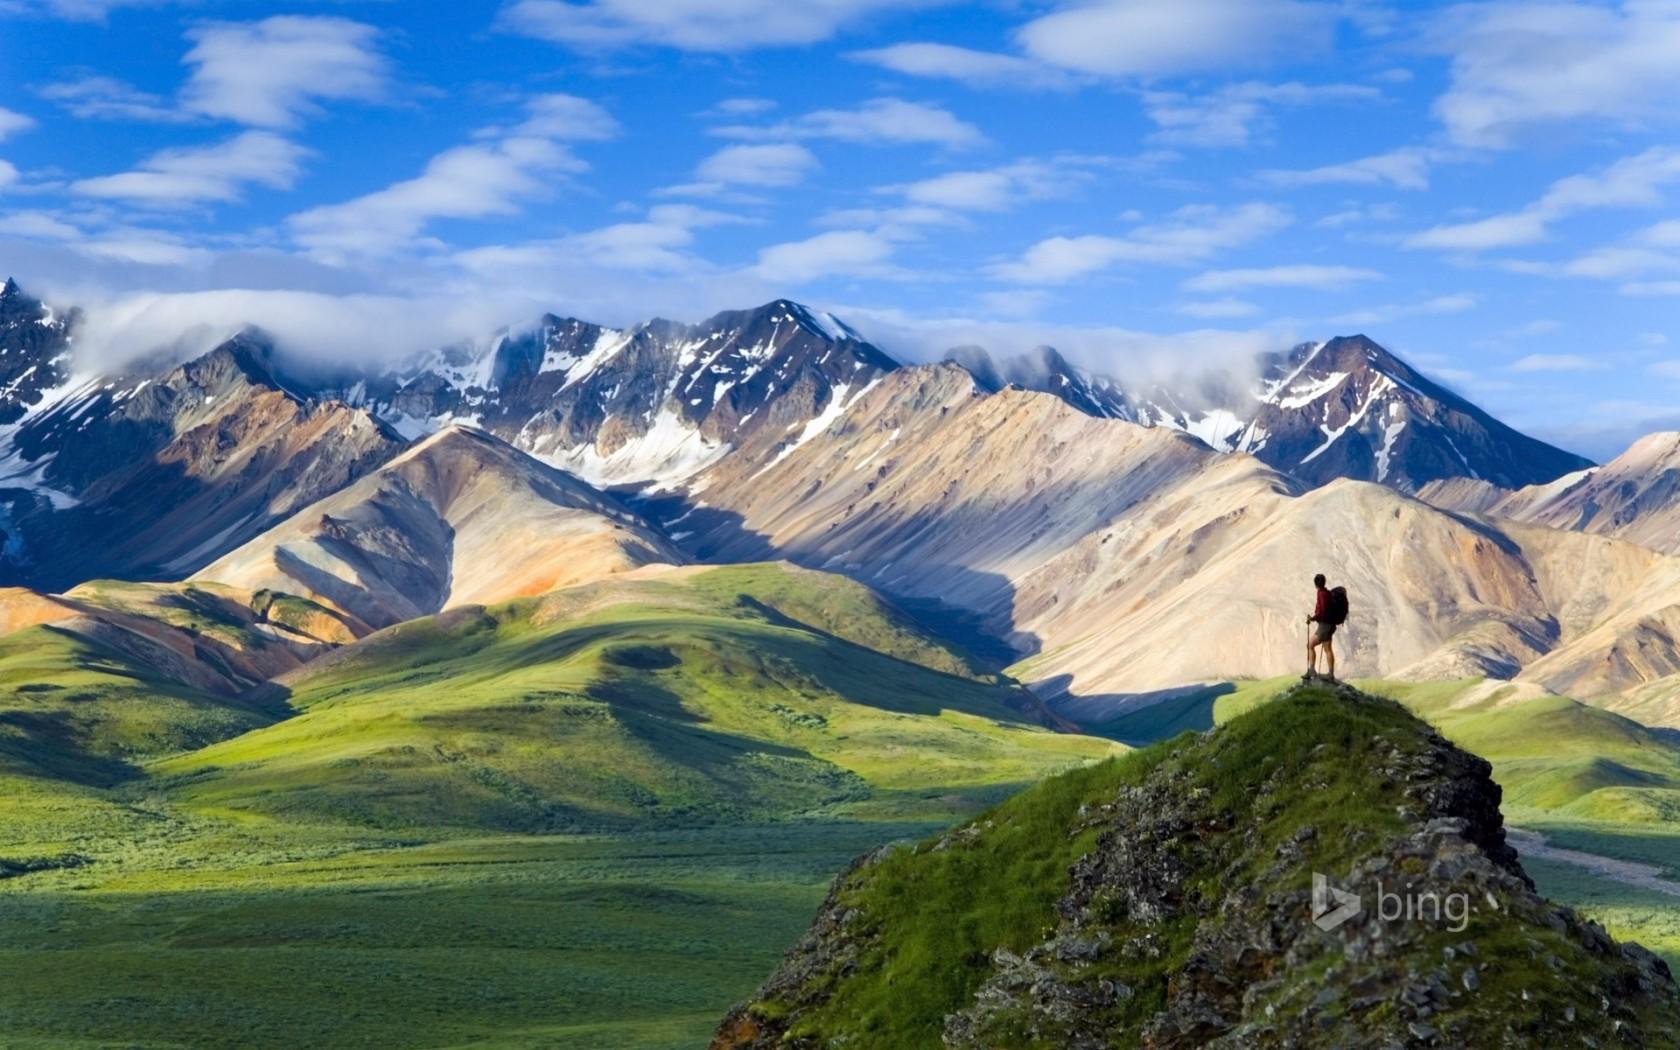 Desktop Wallpaper Hd 3d Full Screen 1080p Denali National Park Wallpapers Hd Wallpapers Id 13886